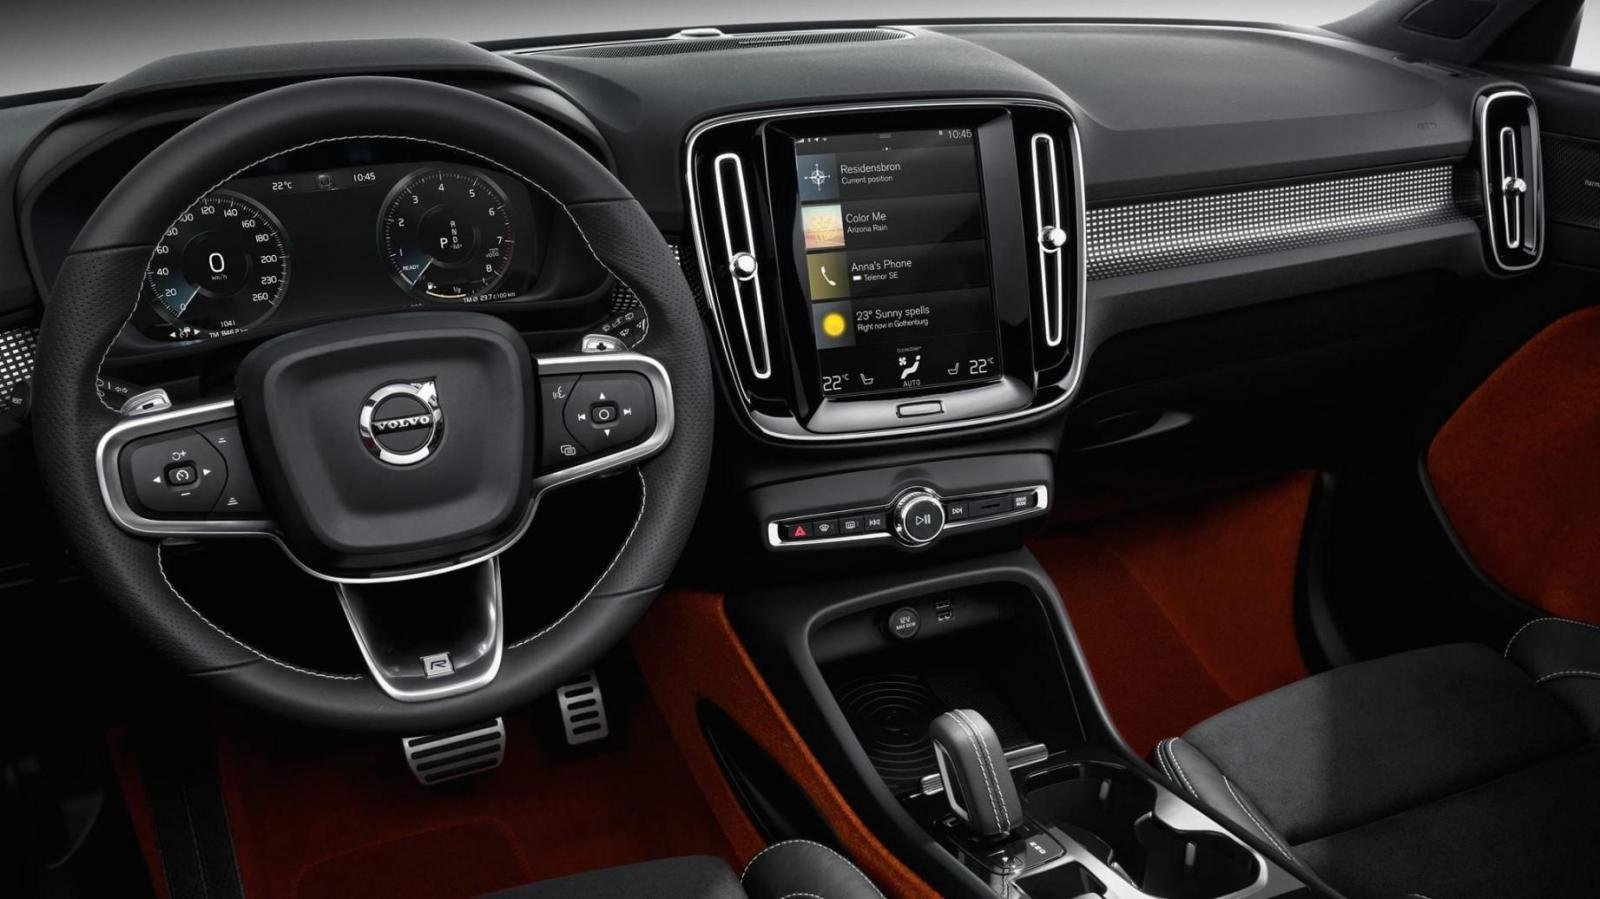 Volvo XC40 Momentum T5 AWD 2020 Audi Q3 40 TFSI S Line 2020 comparativa